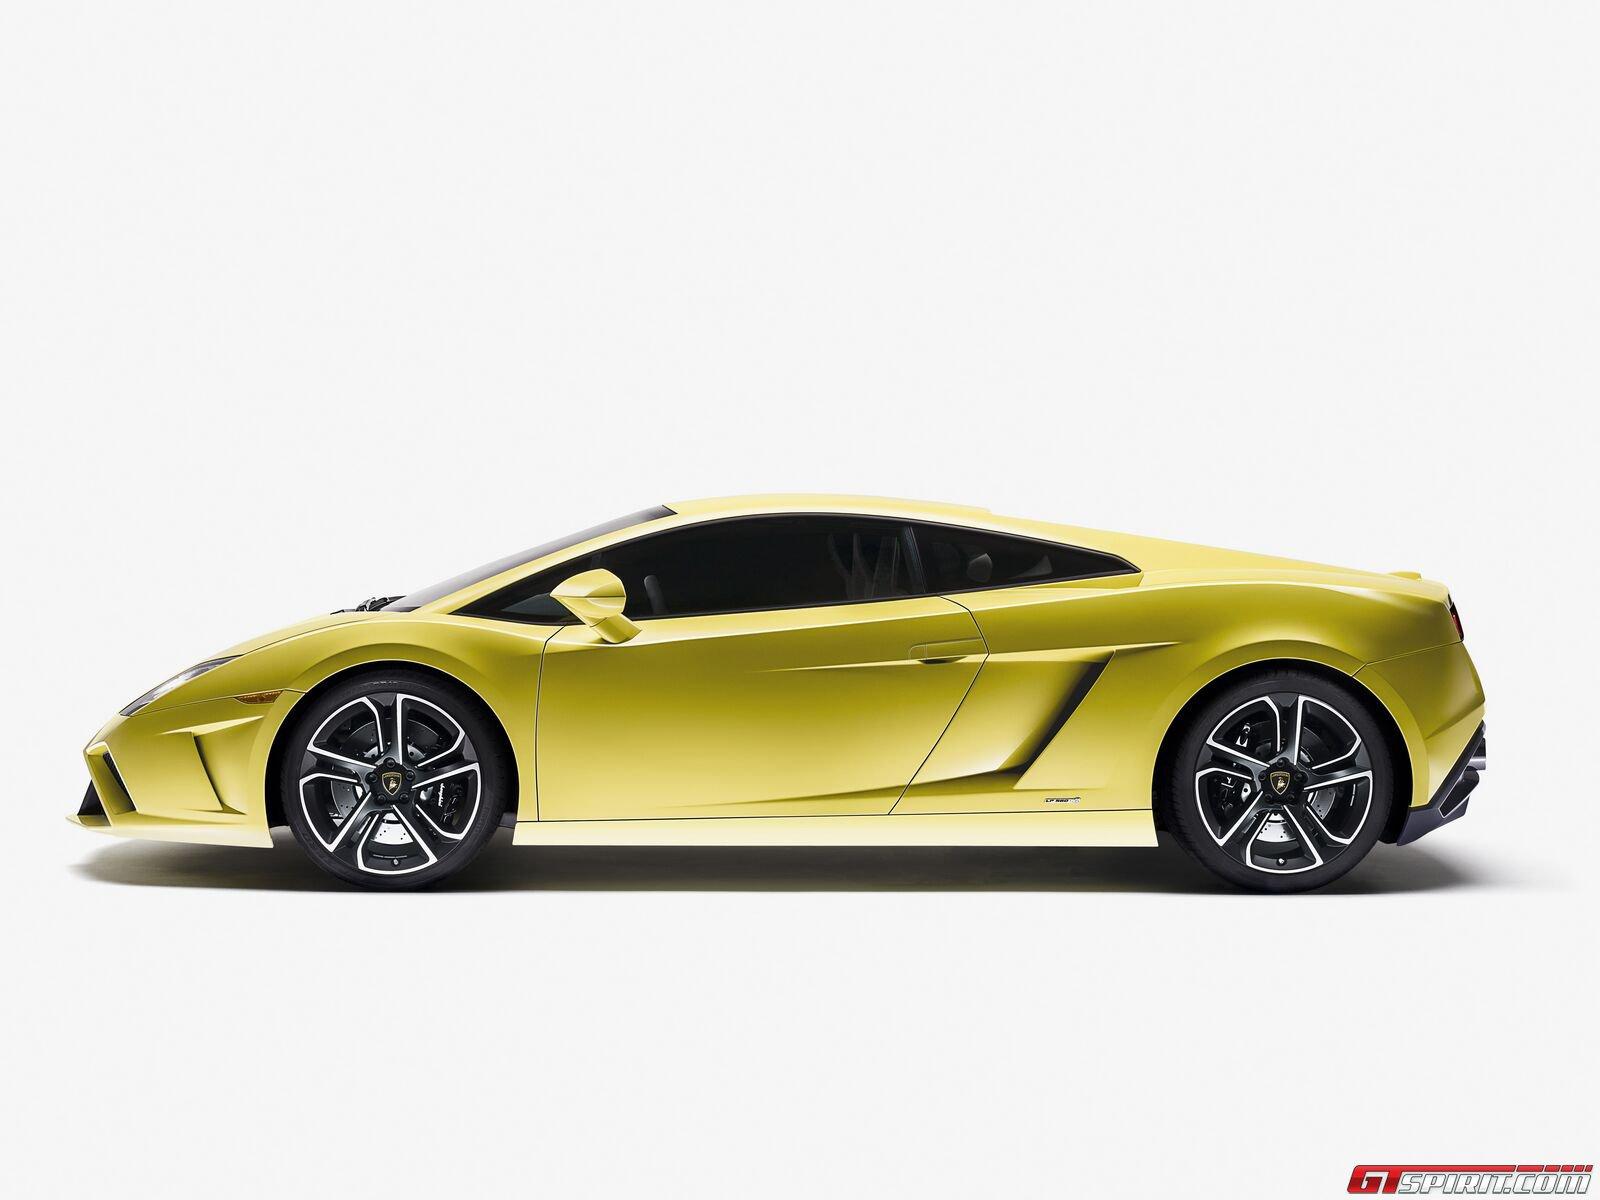 Lamborghini Gallardo LP560-4 Facelift Photo 4